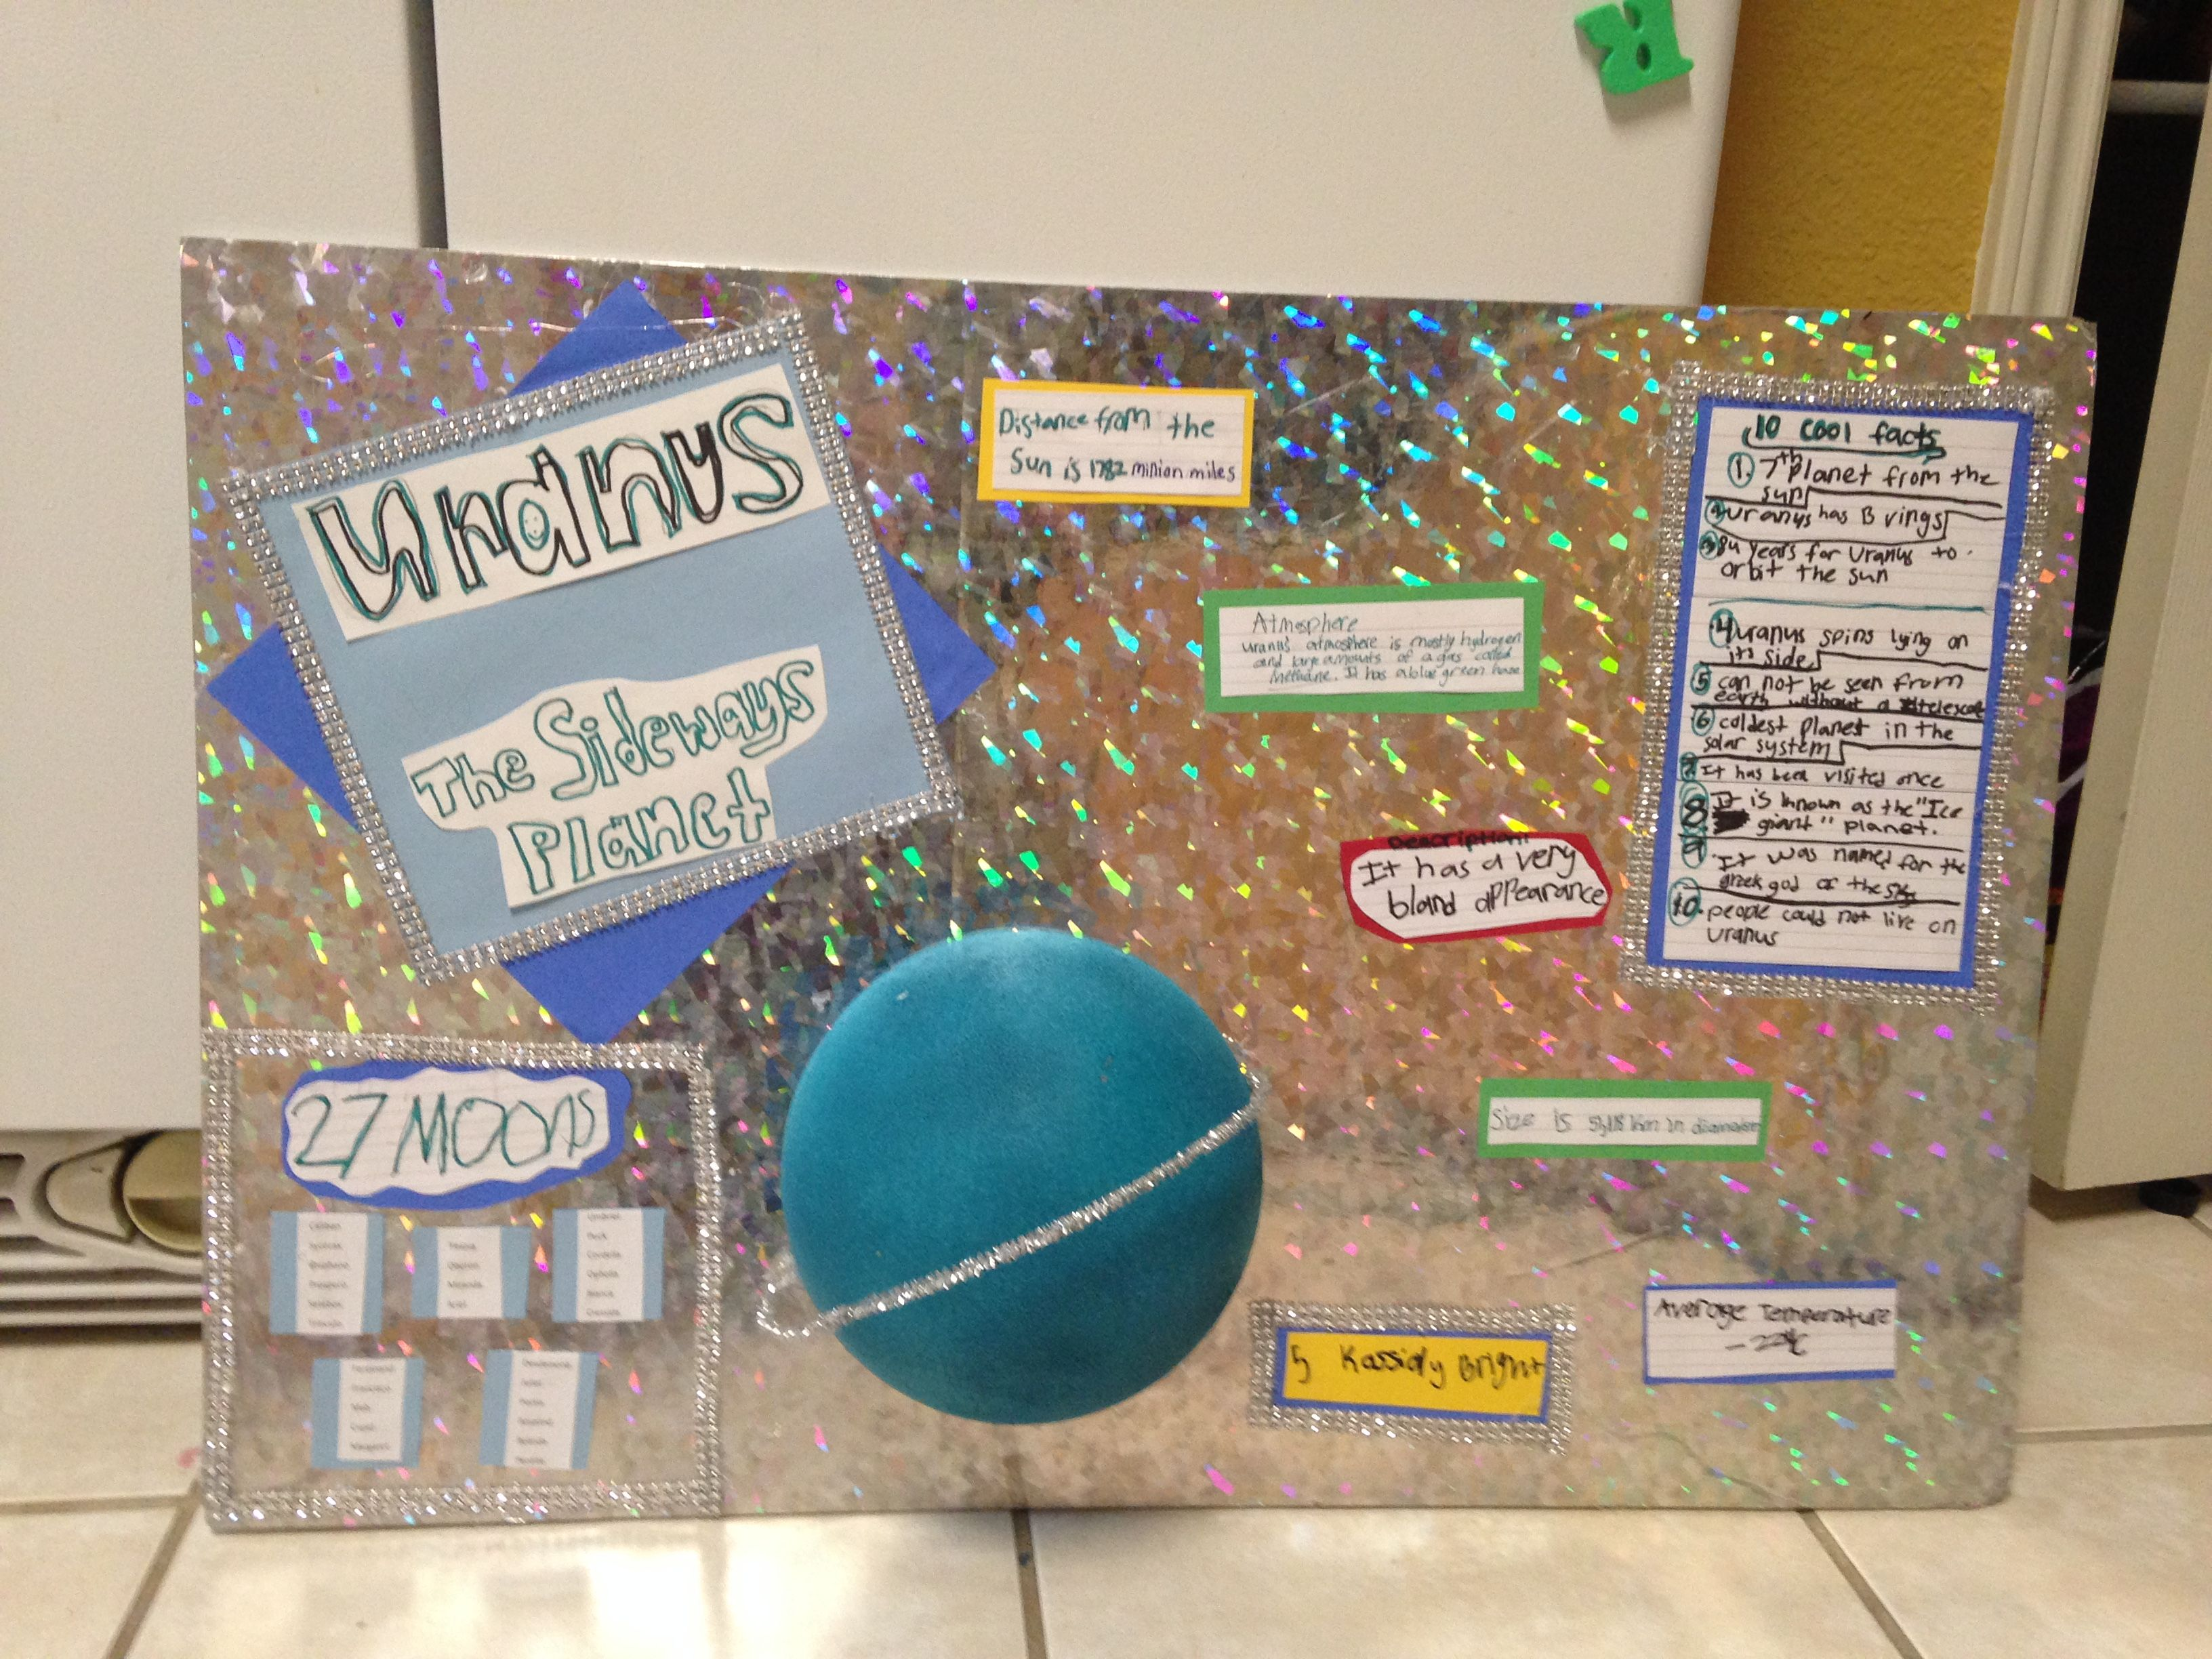 Projects on uranius Science Neptune project Uranus